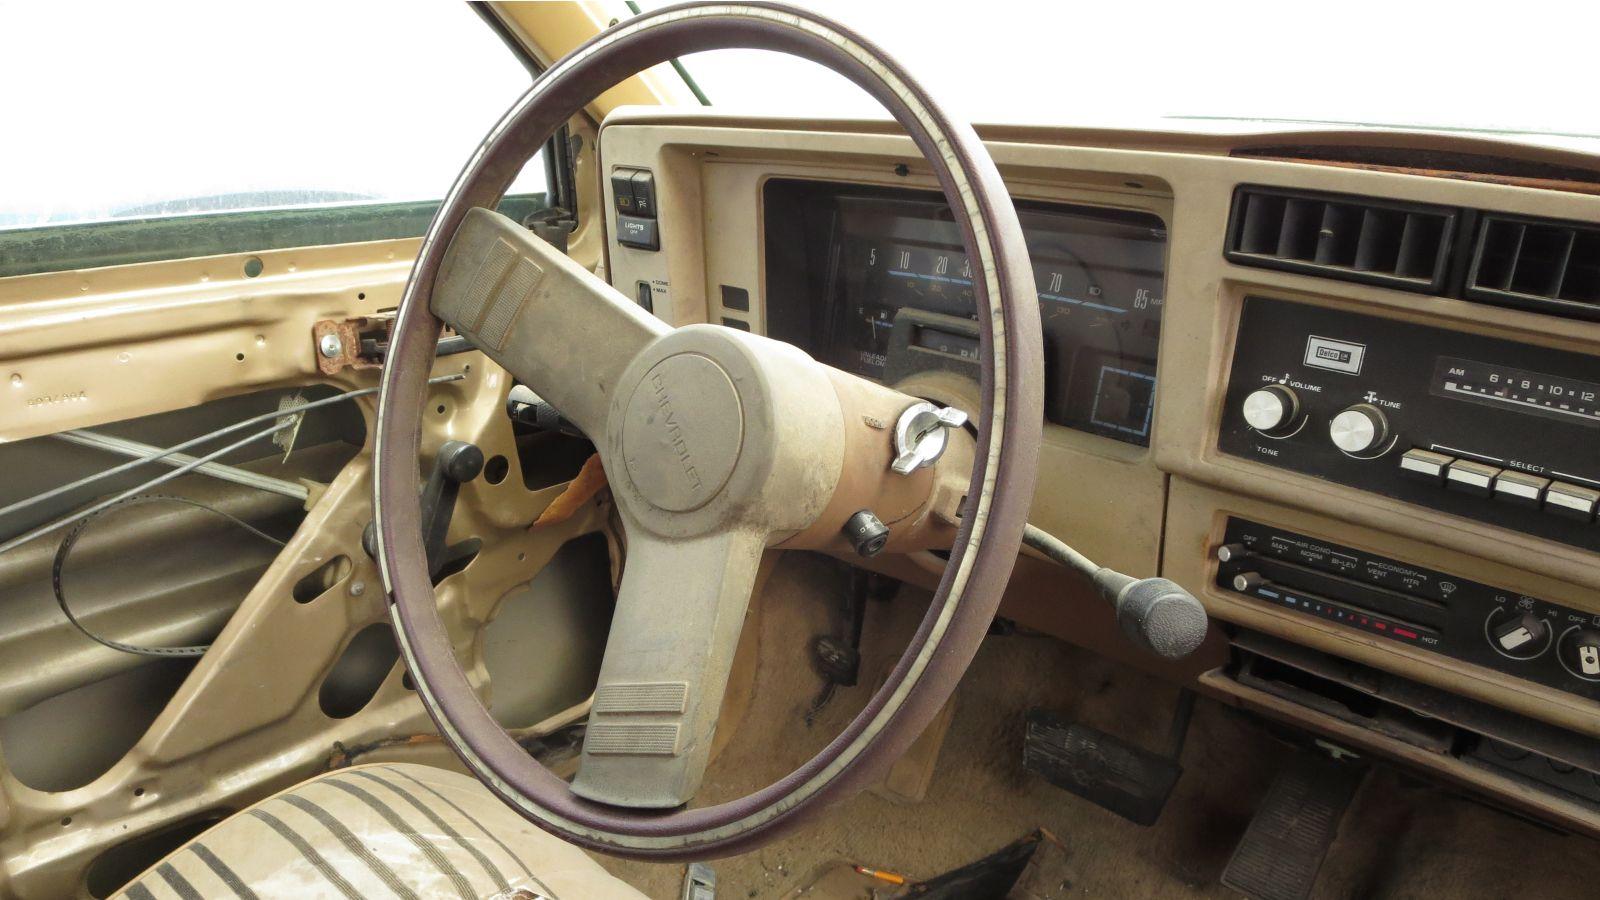 All Chevy 1985 chevrolet citation : Junkyard Gem: 1985 Chevrolet Citation 5-Door Hatchback - Autoblog